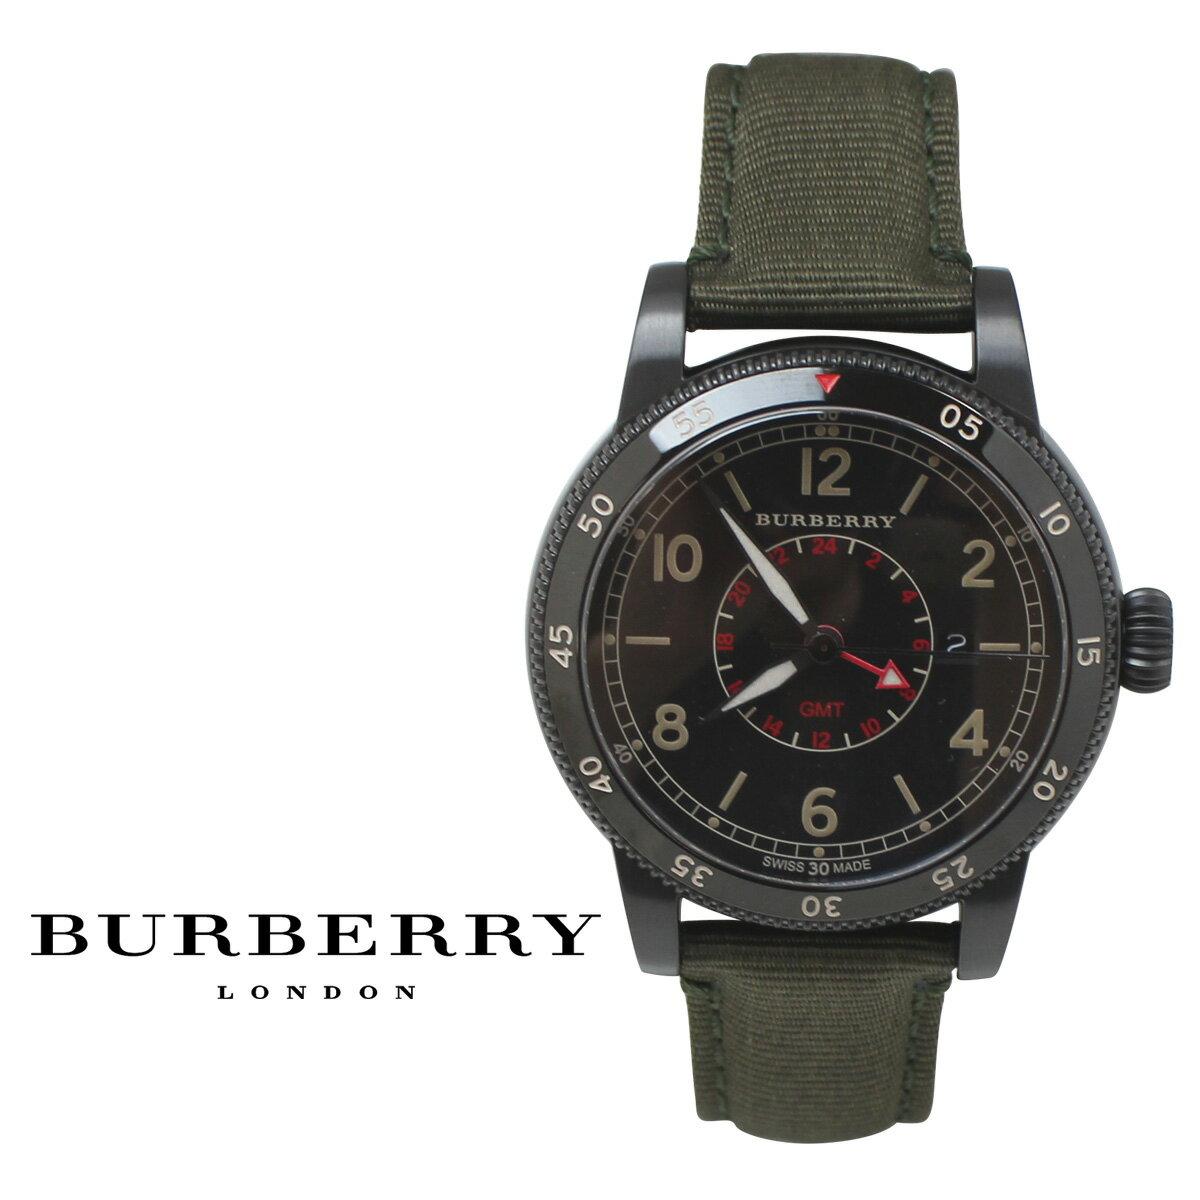 BURBERRY バーバリー  腕時計  THE UTILITARIAN BU7855  メンズ [ あす楽対象外 ]